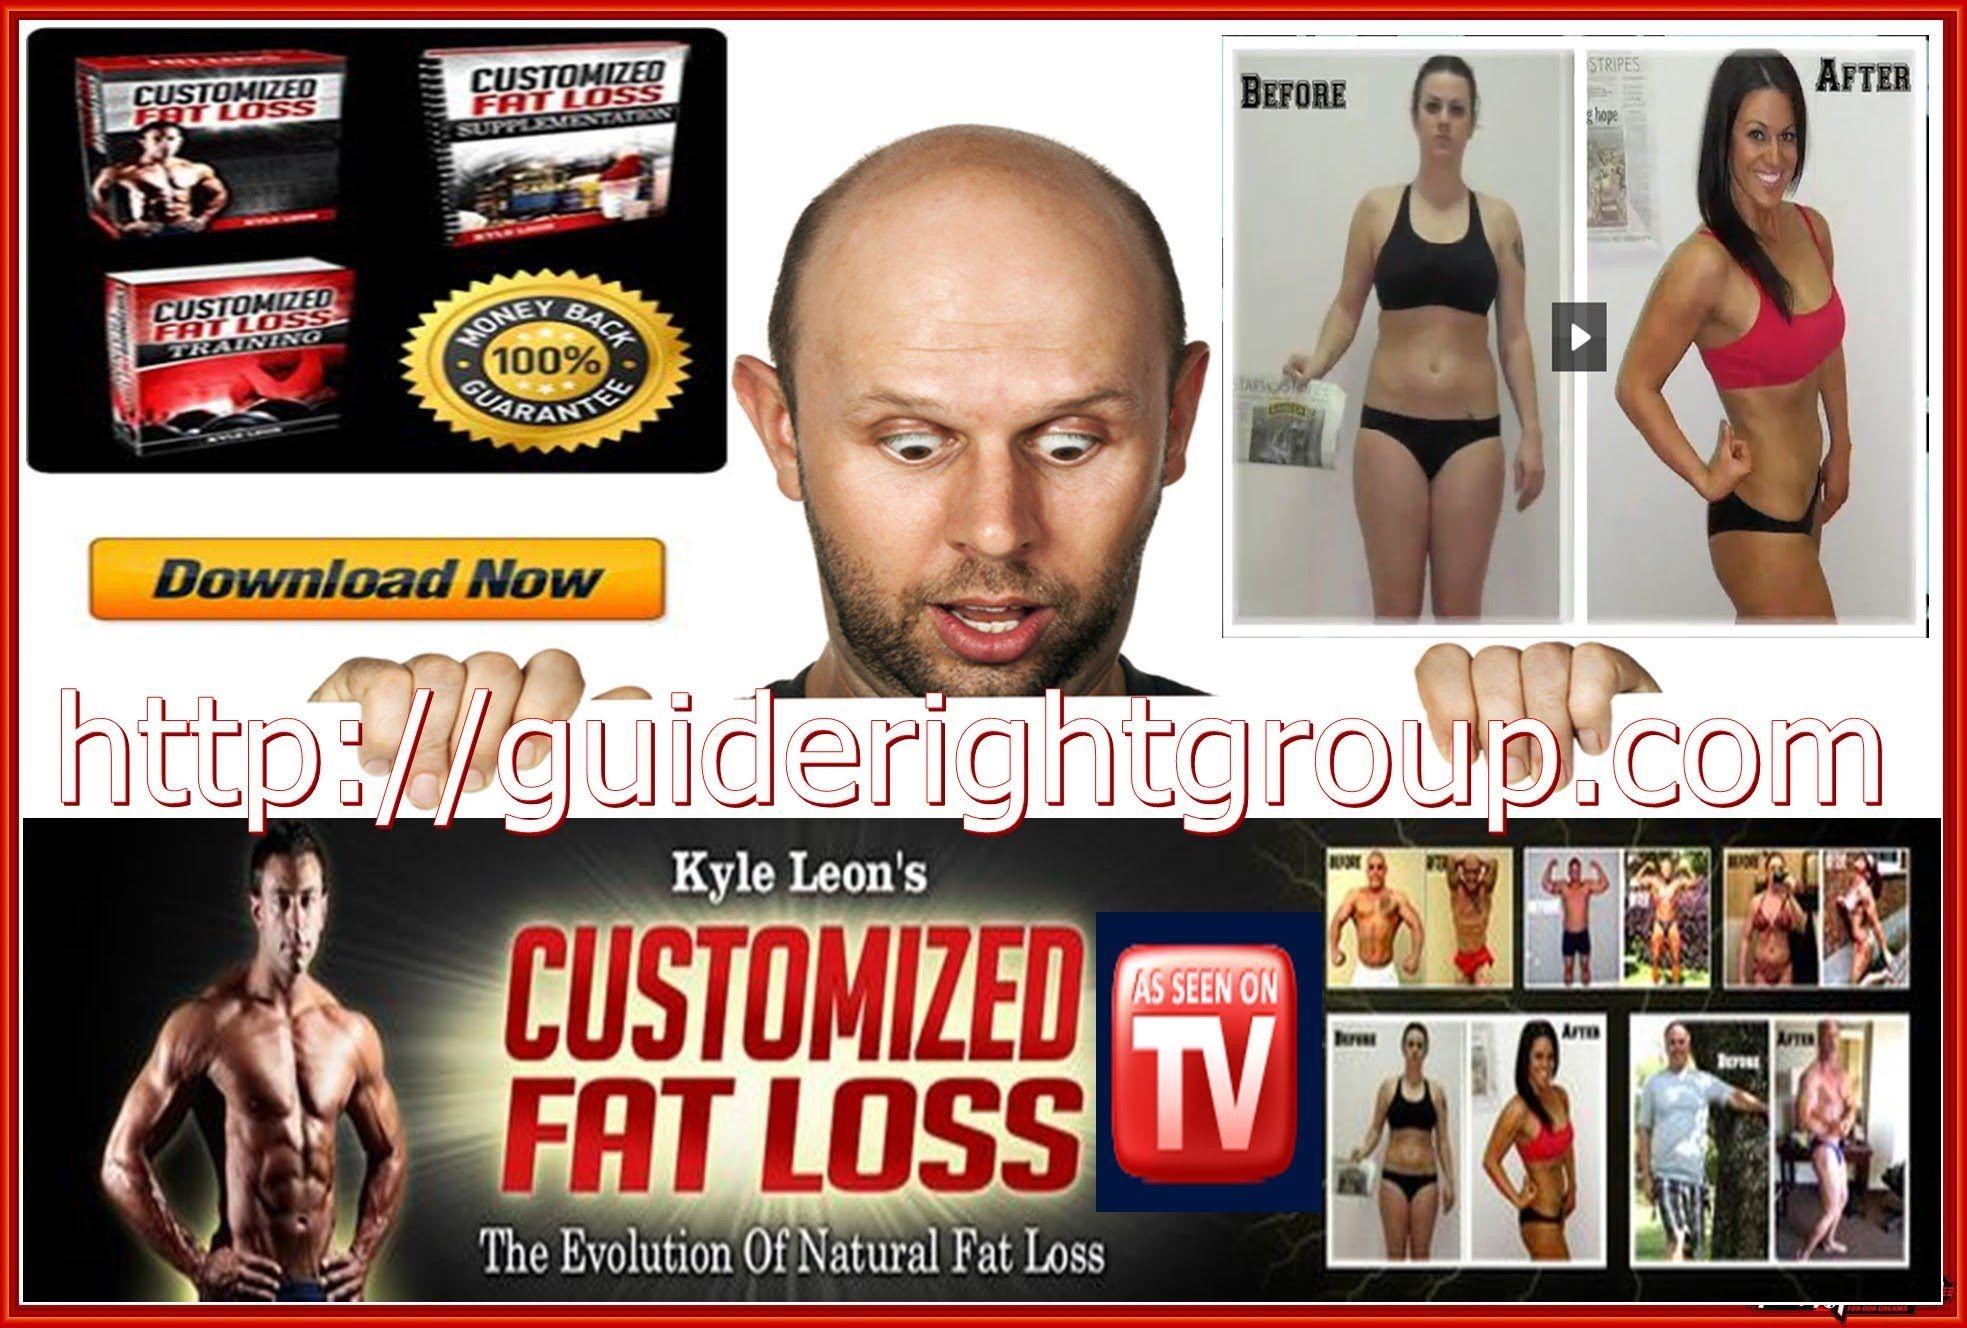 Customized Fat Loss PDF   CustomizedFatLoss.Com Click Below To Check Detail Info http://kyle-leon-customized-fat-loss.blogspot.com